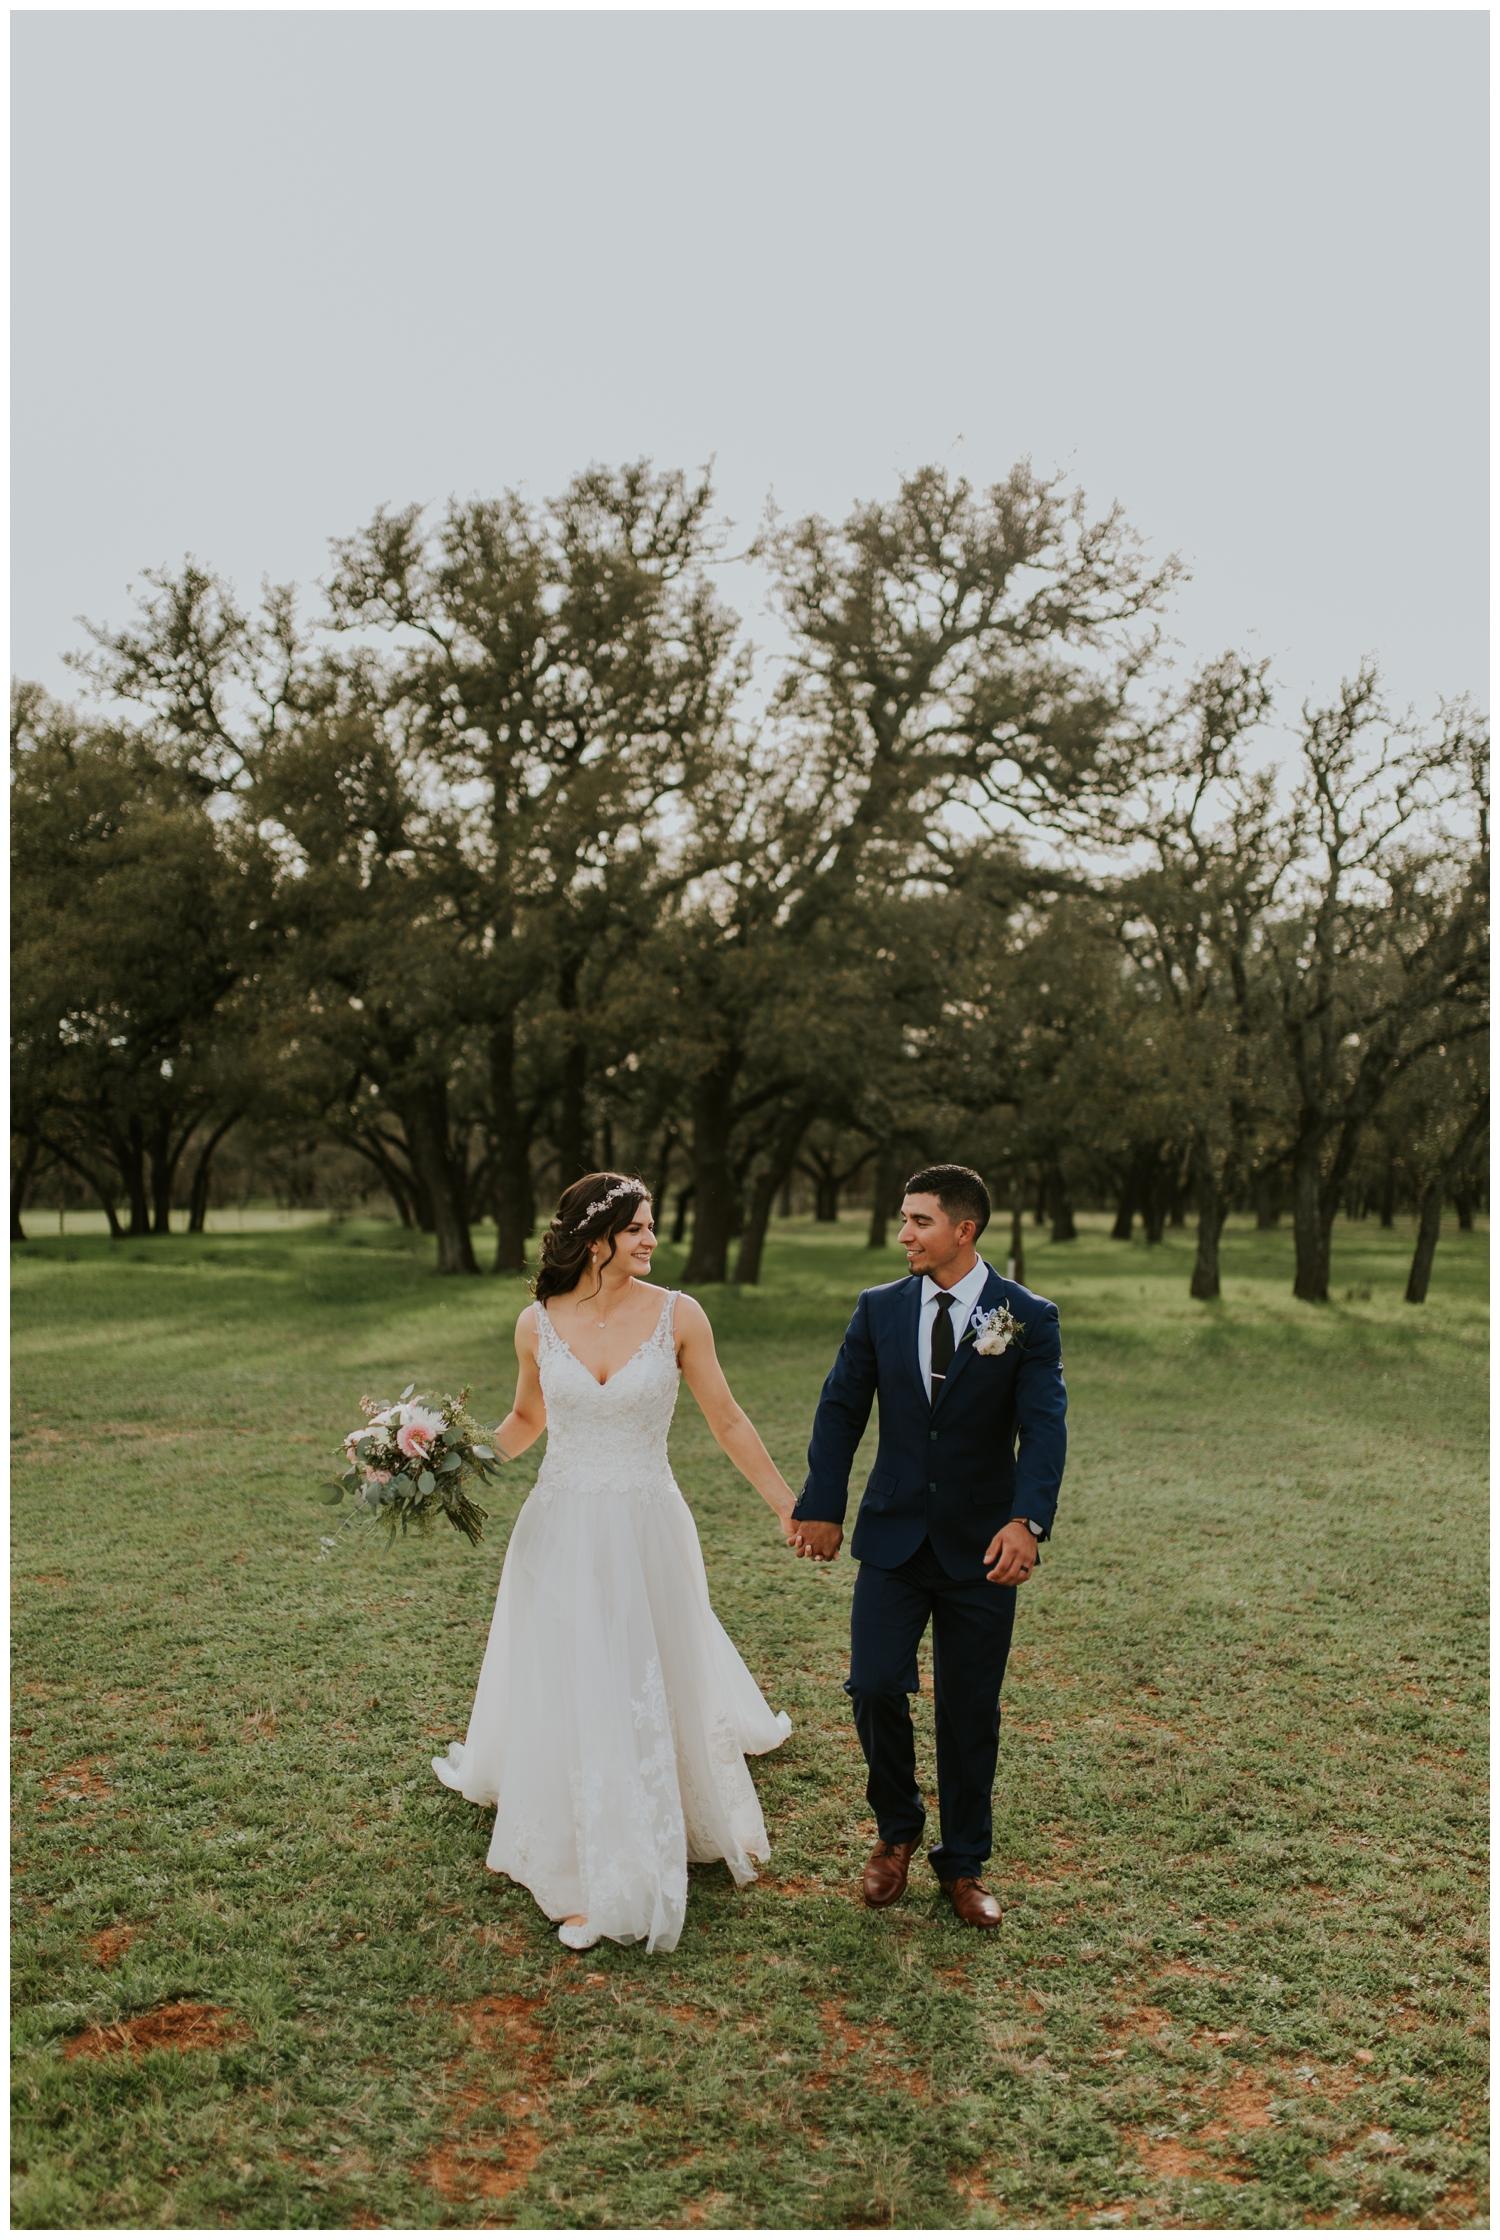 Ashlee+Mike, Featherstone Ranch Spring Wedding, San Antonio, Contista Productions Wedding Photography_0012.jpg